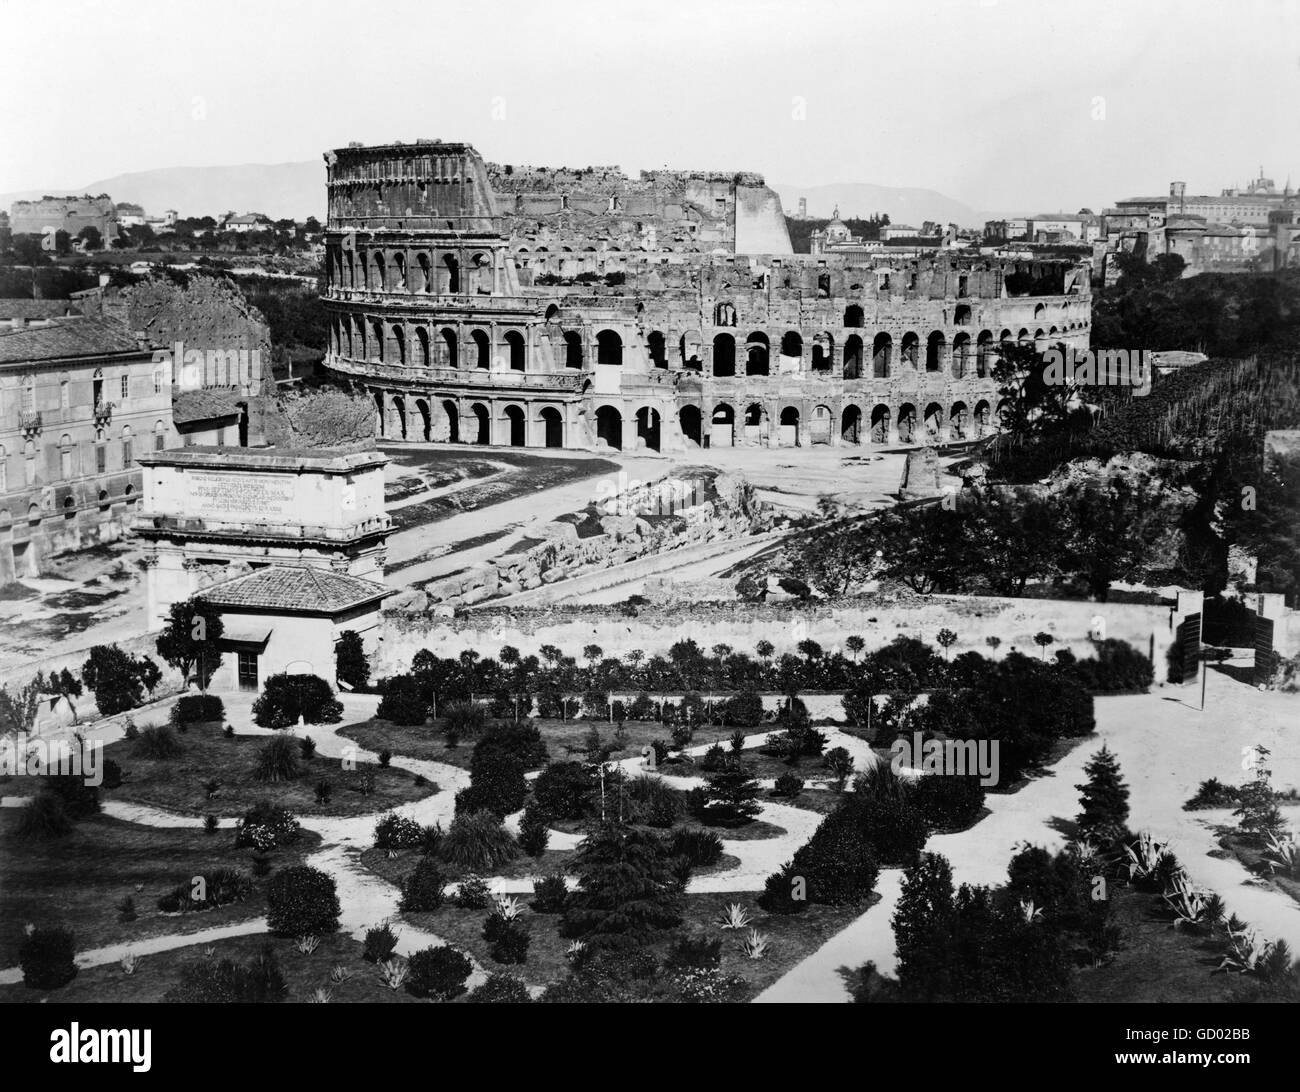 Coliseo de Roma. Siglo xix vista del Coliseo de Roma. Foto tomada entre 1860 y 1890 Imagen De Stock